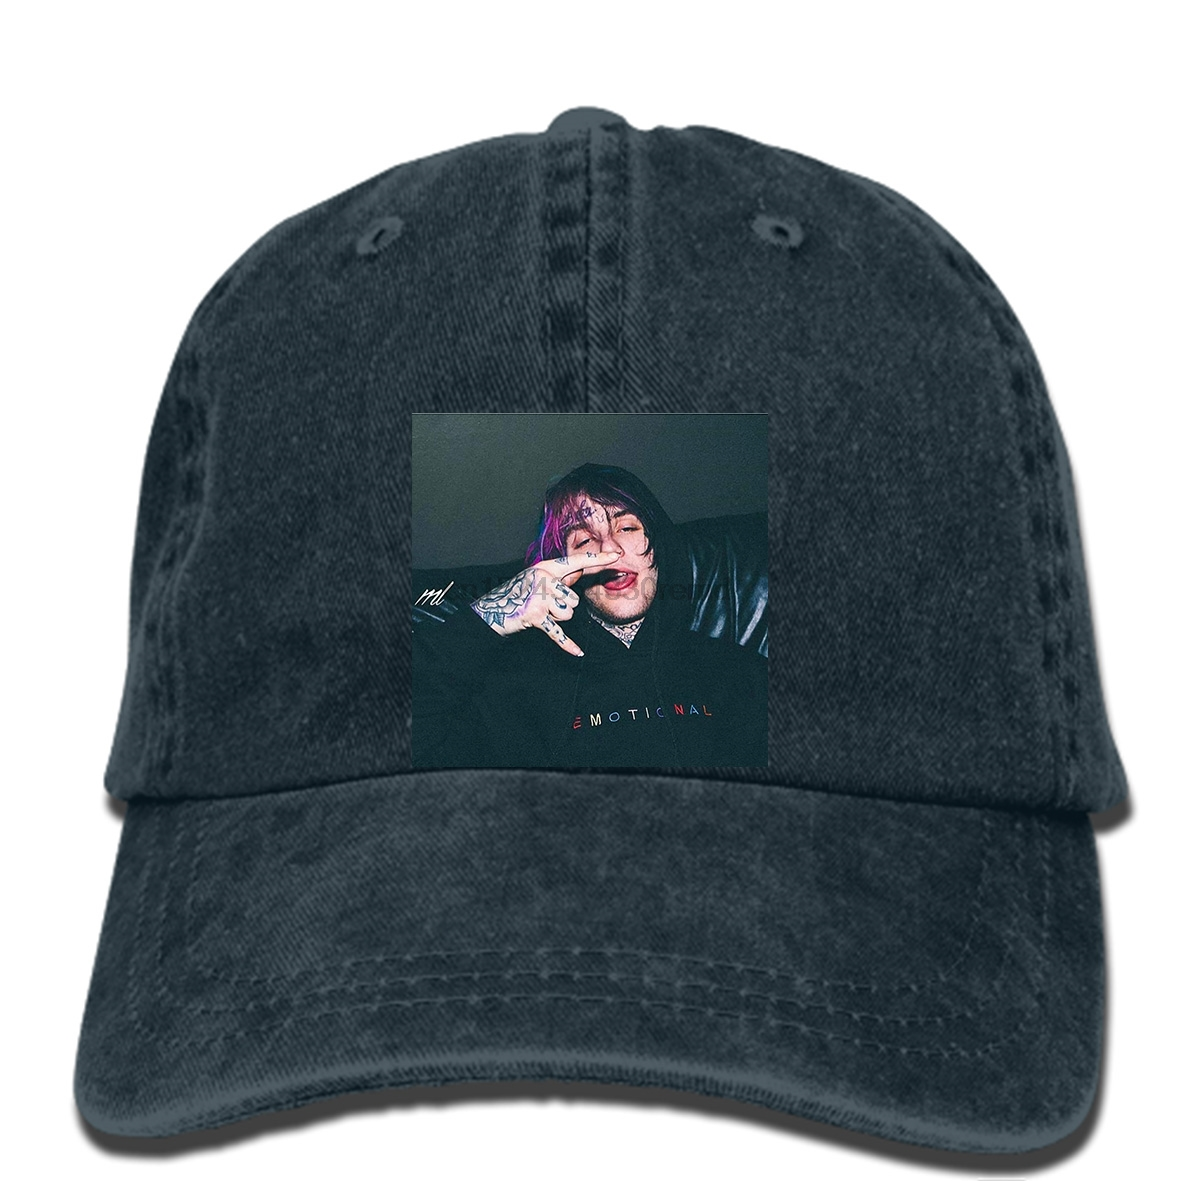 854100966415b hip hop Baseball caps Lil Peep Men  caps s hat Gift More and Colors New  Brand